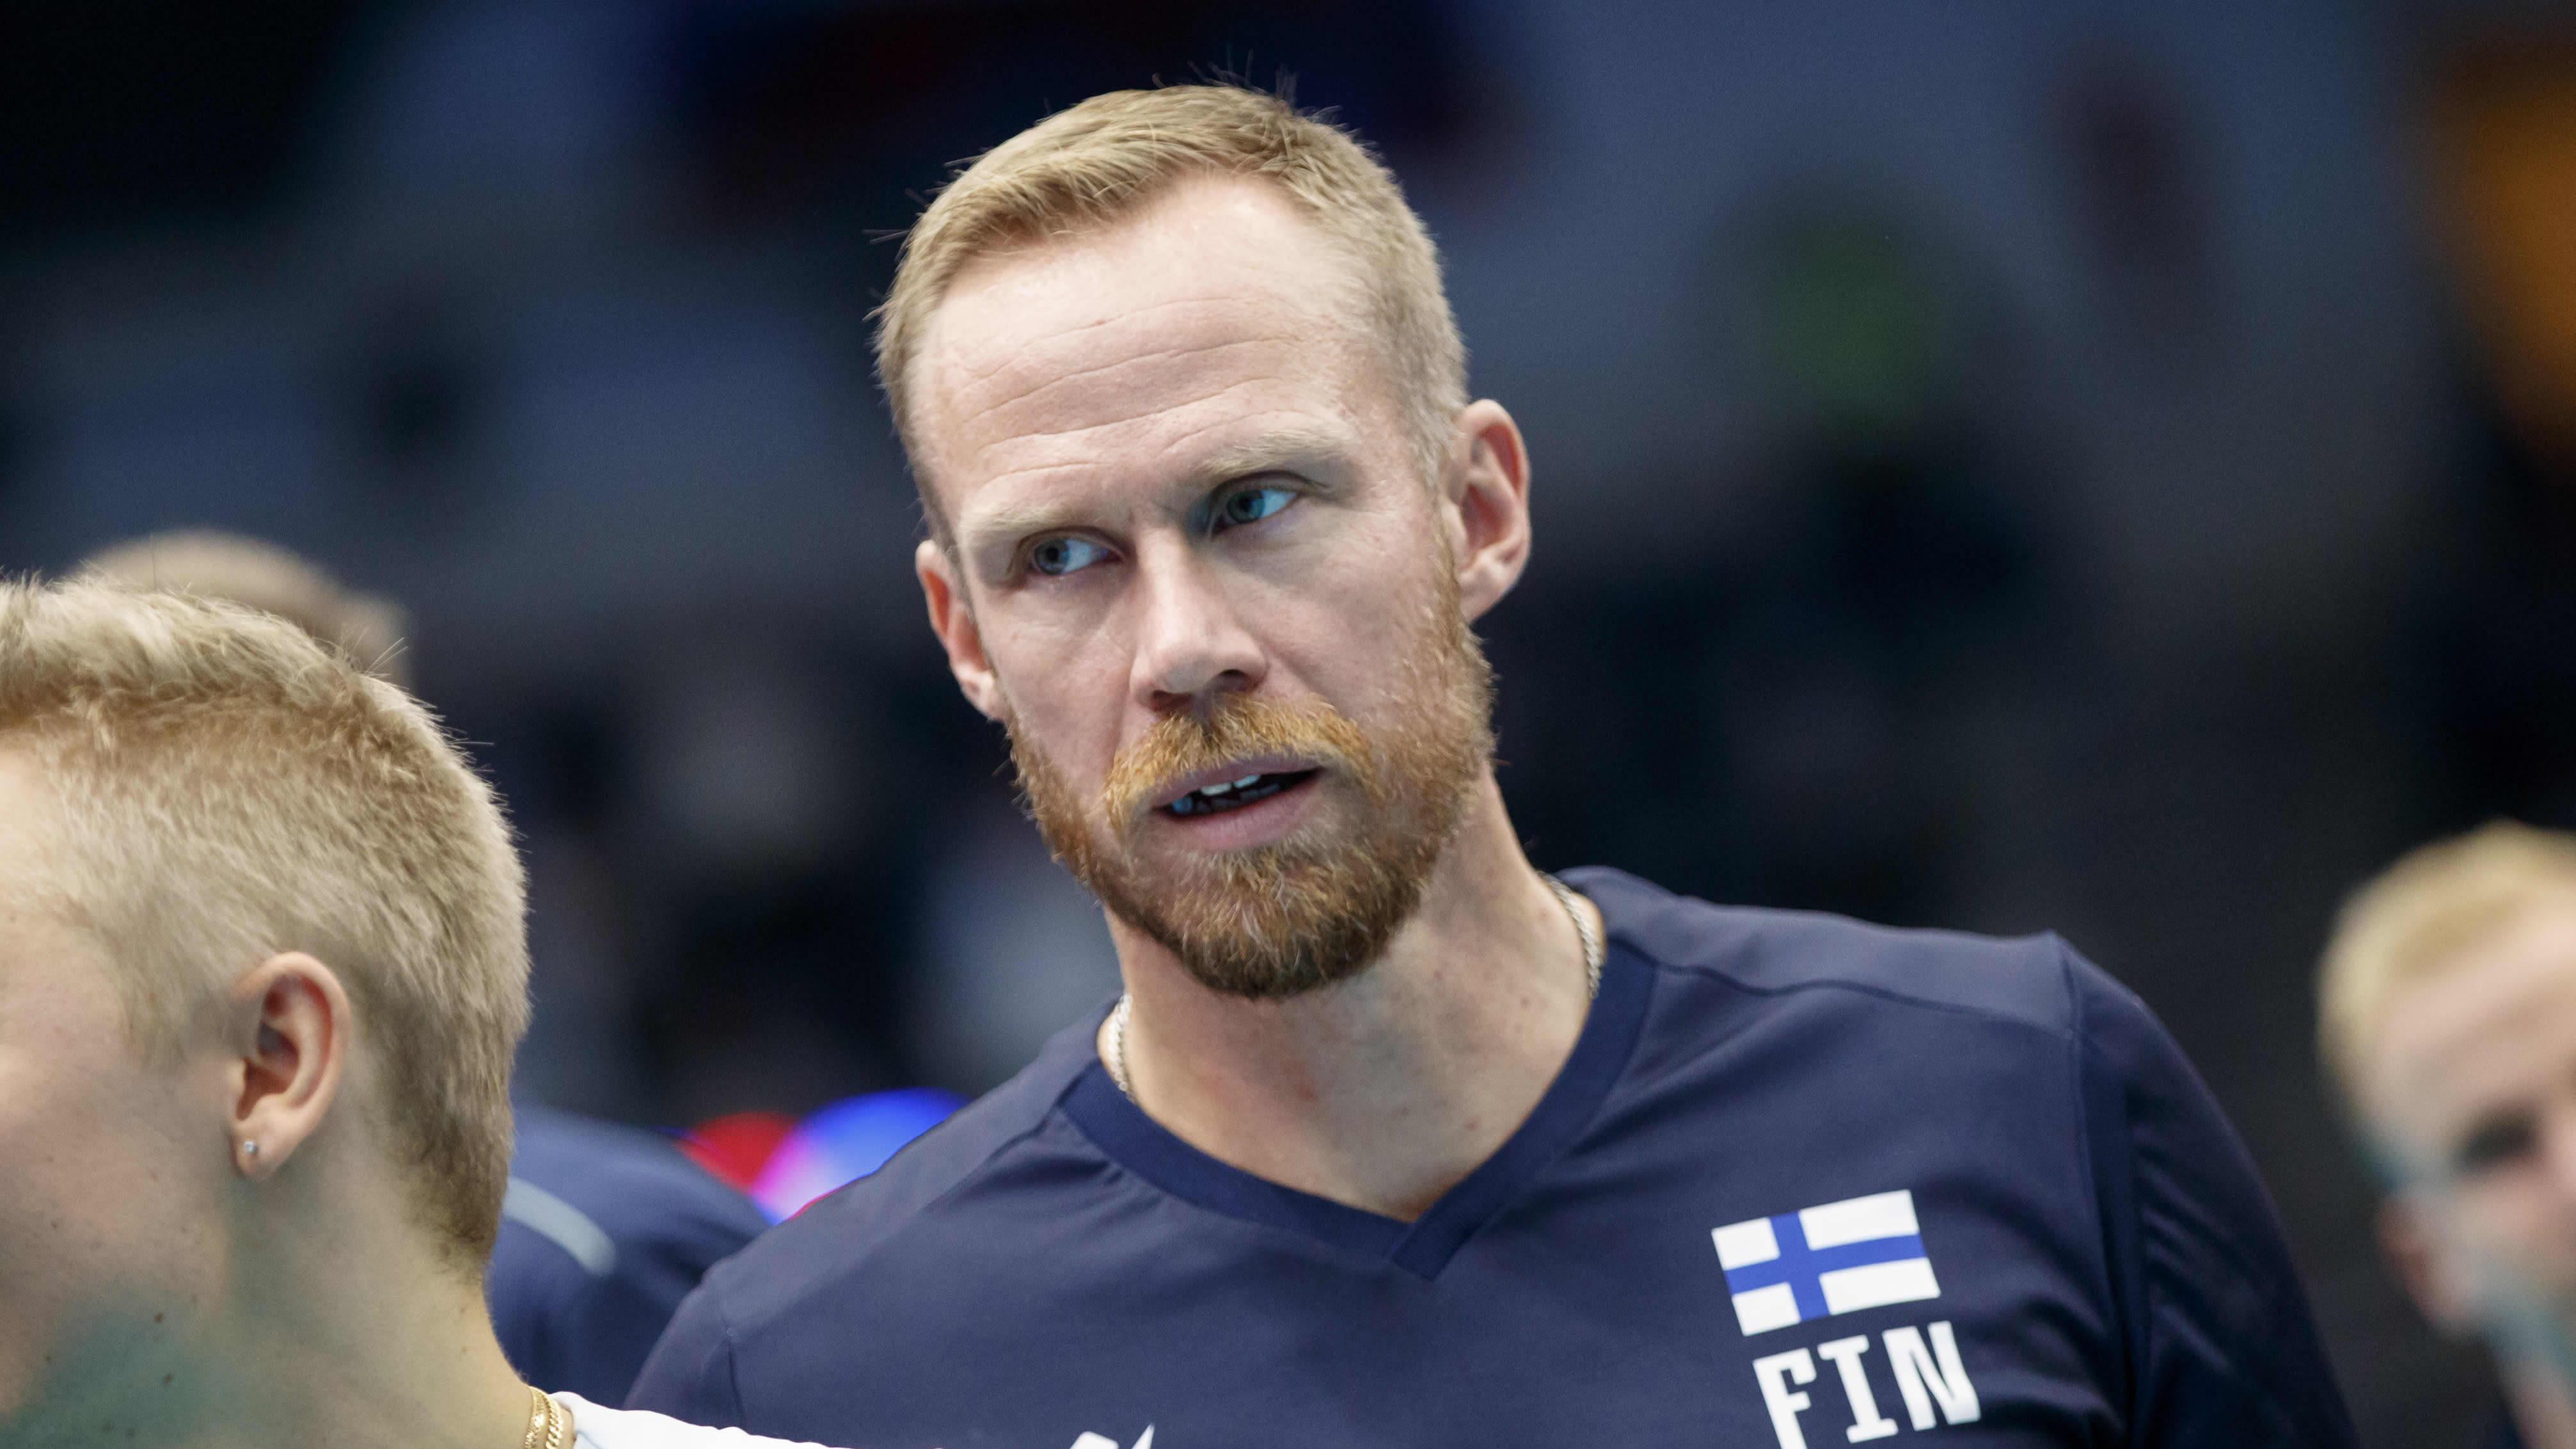 Mikko Esko kuvassa.